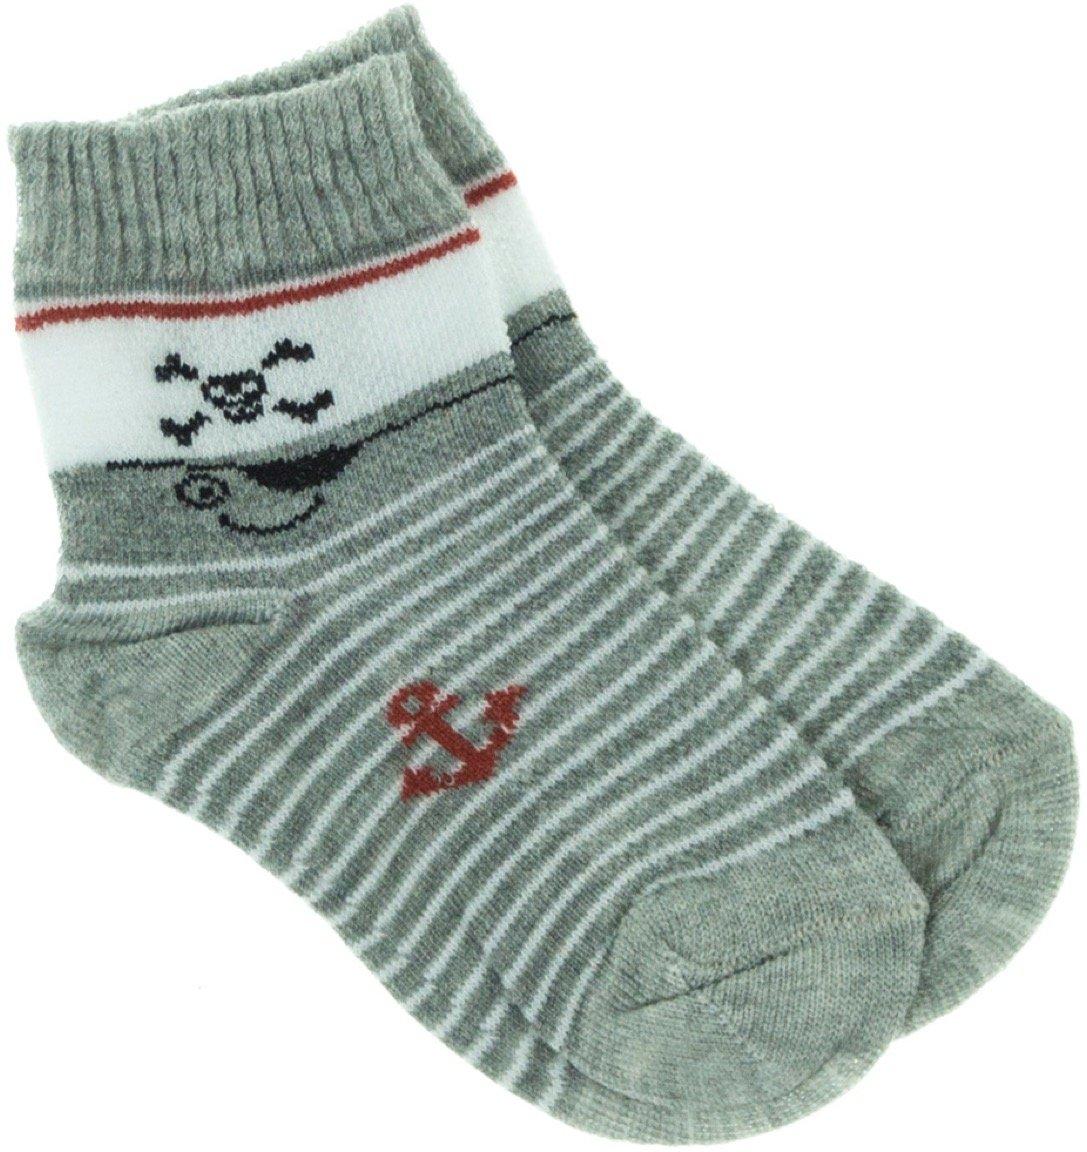 Bella Calze παιδικές κάλτσες «Grey Pirate»